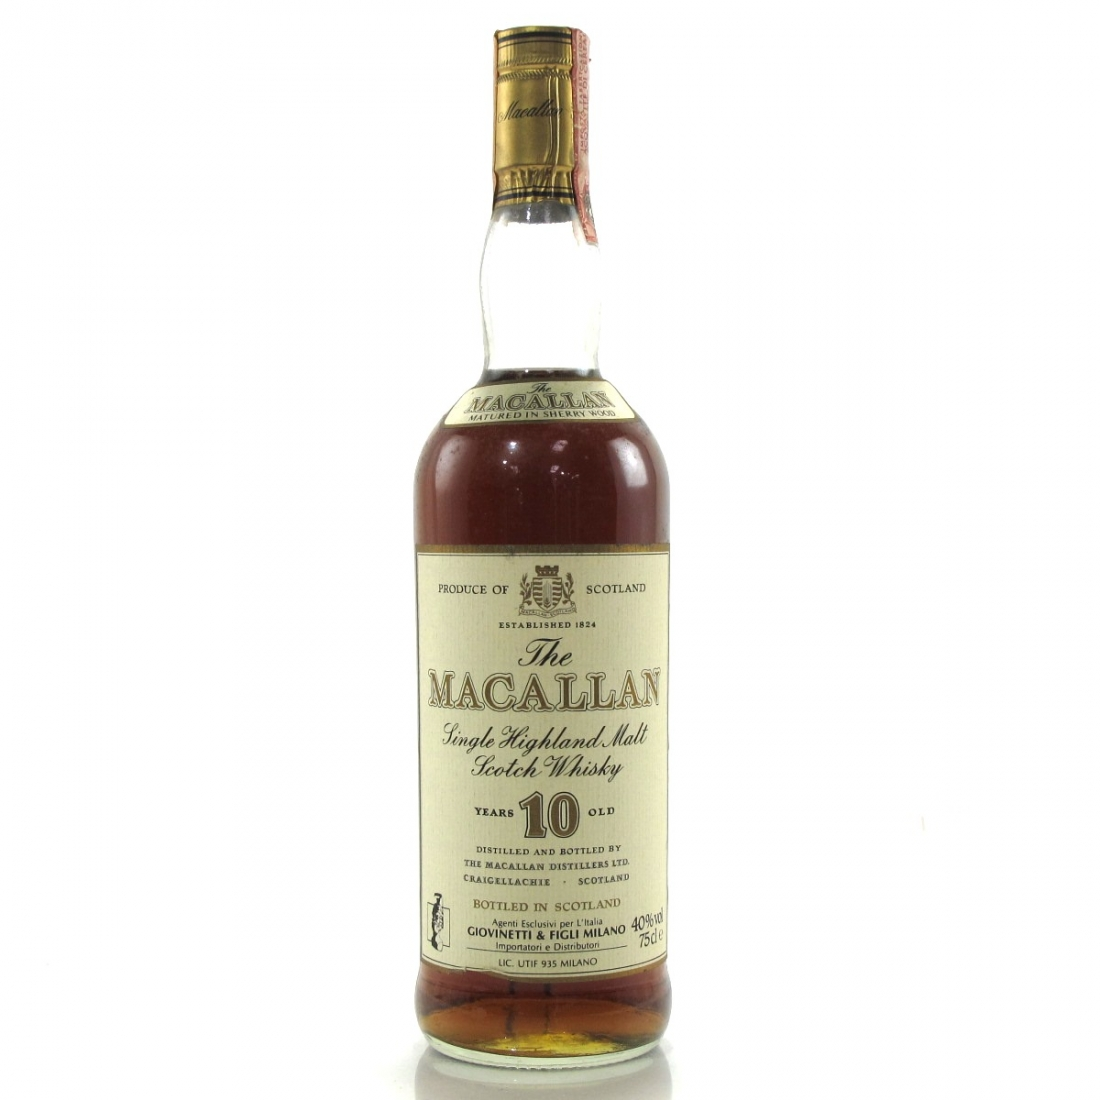 Macallan 10 Year Old 1980s / Giovinetti Import